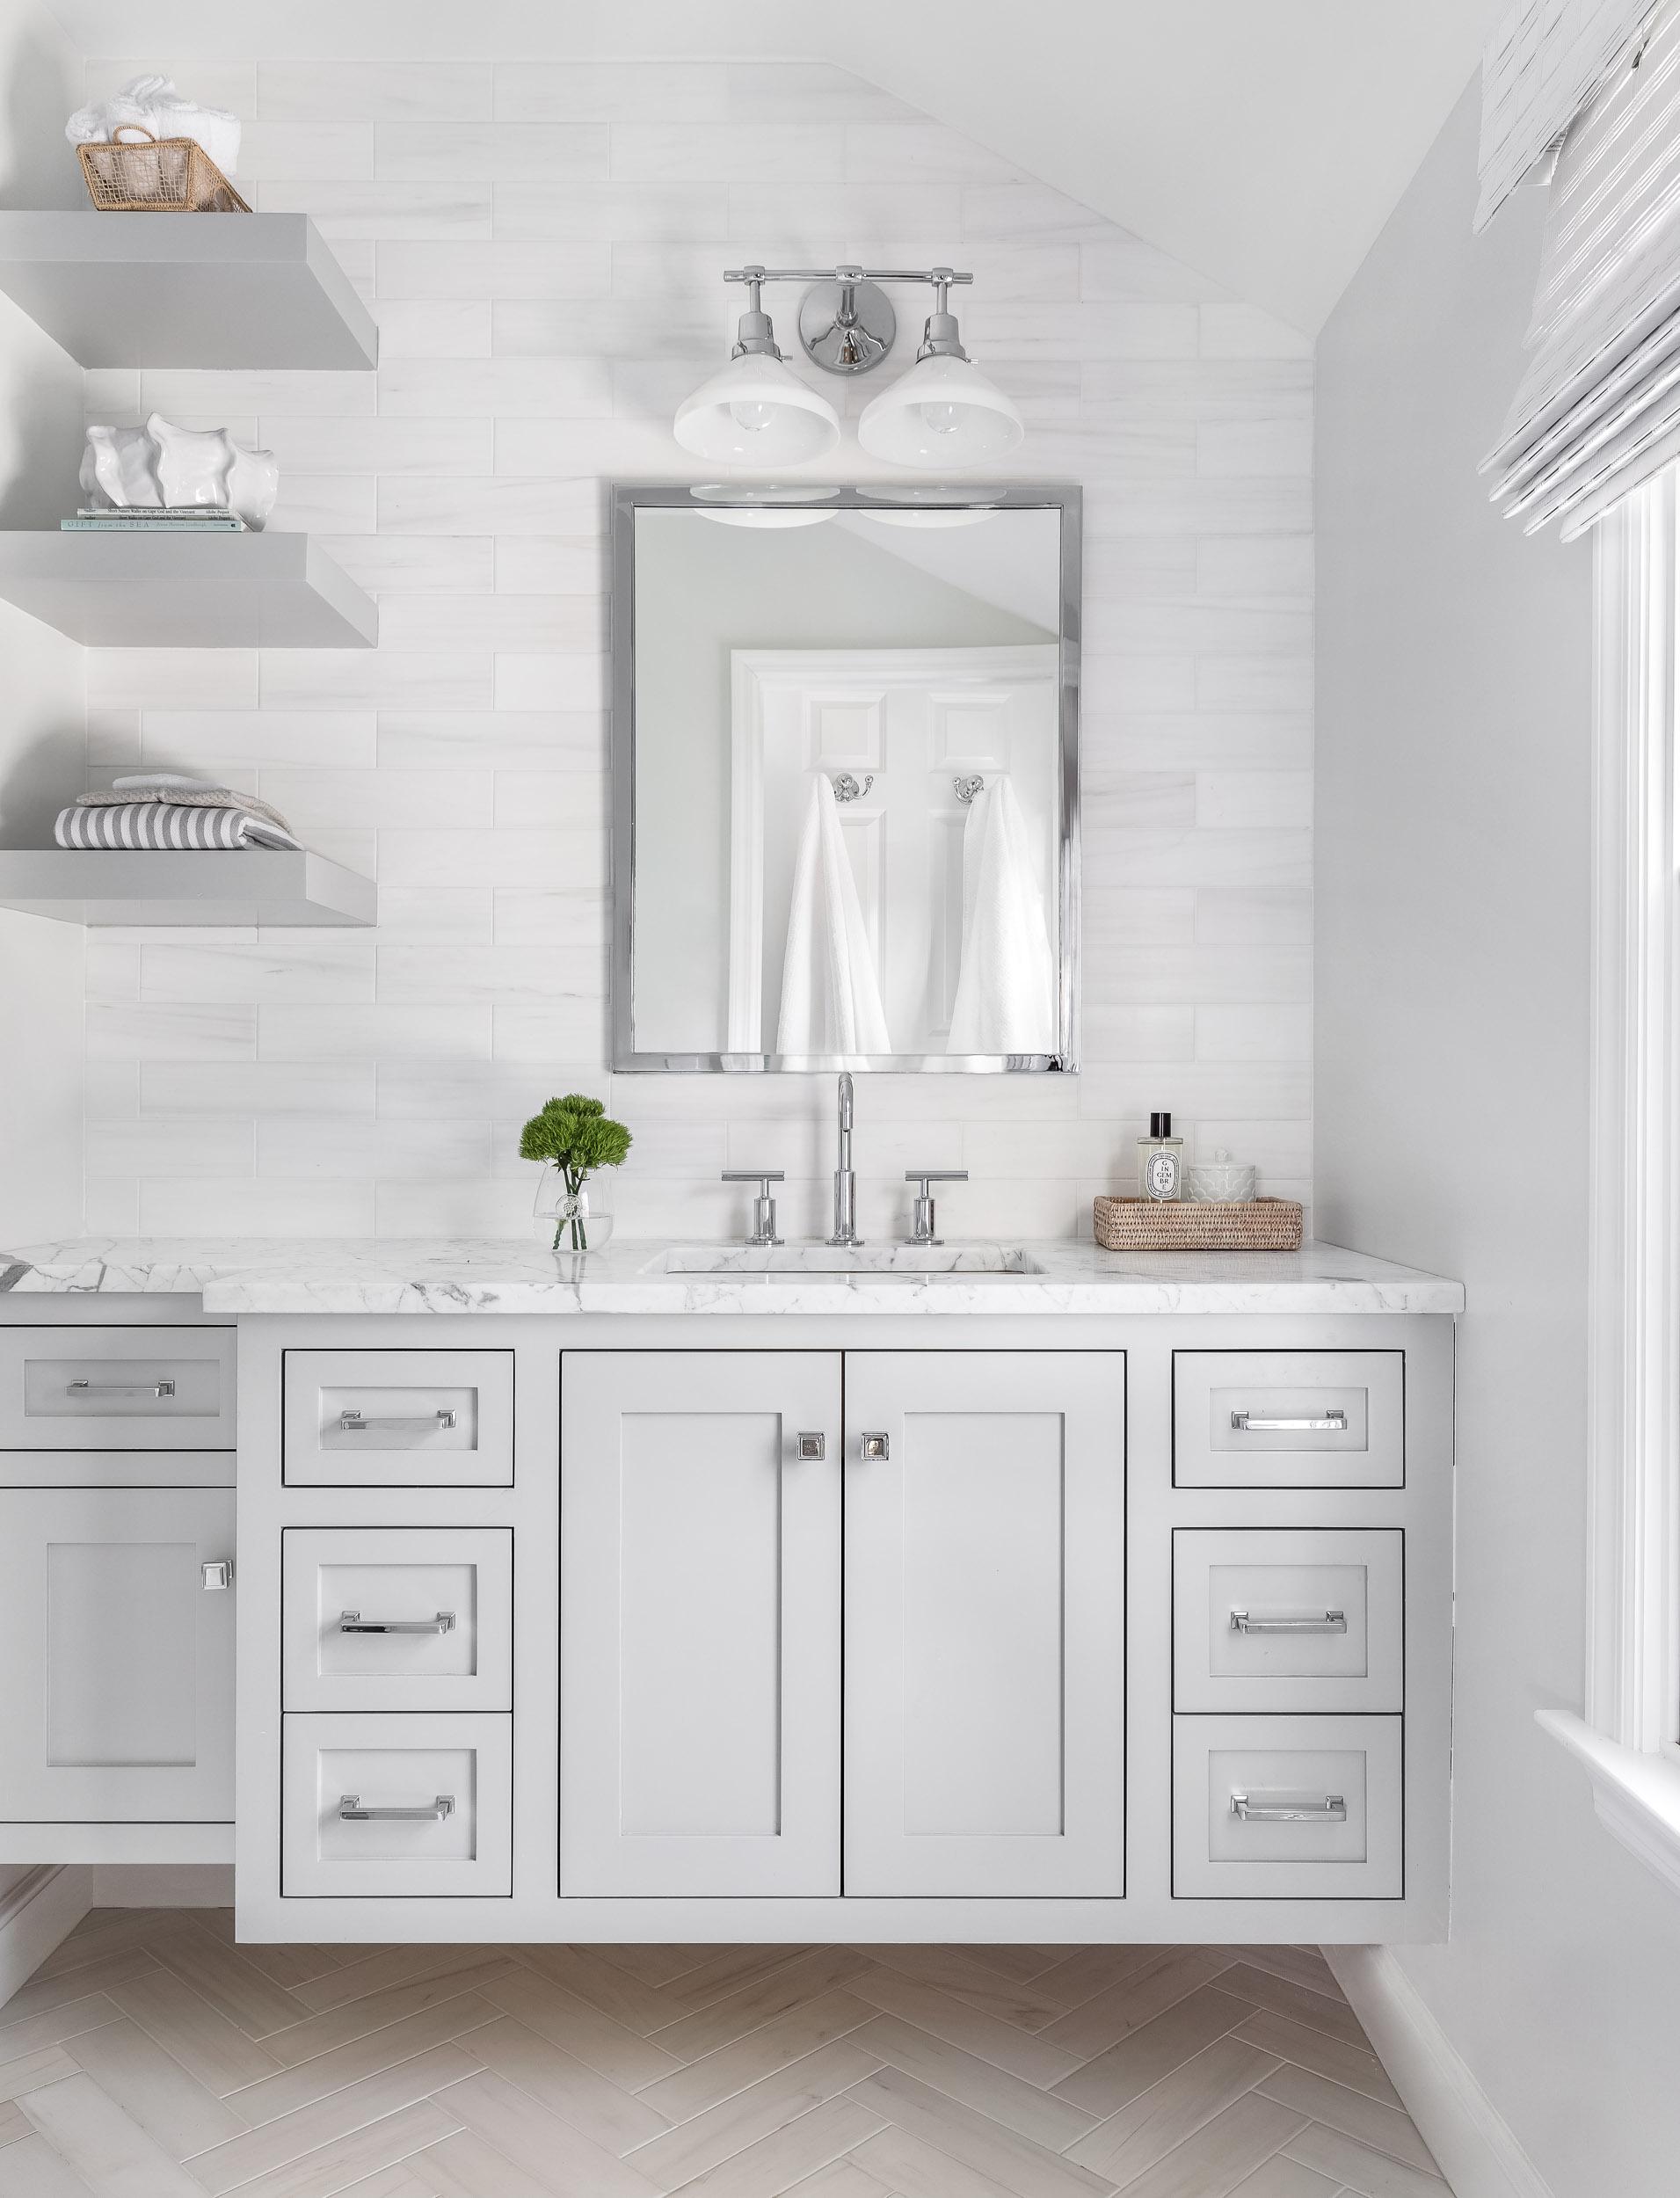 parker and parker design-interior design photography-darien ct-master bathroom-white and grey.jpg